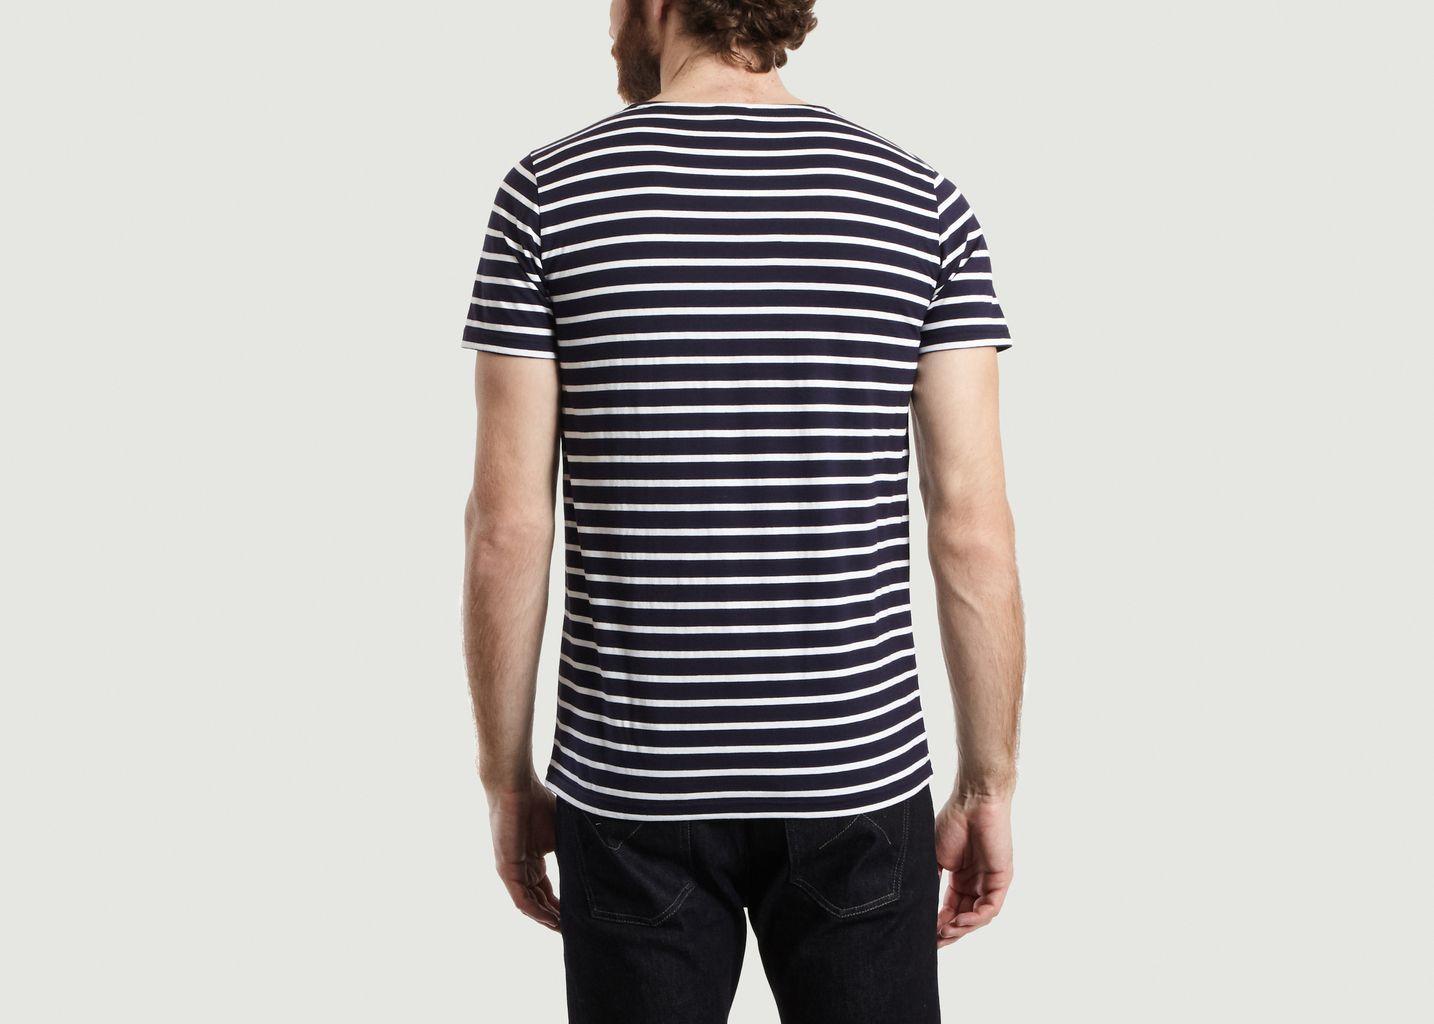 T-Shirt Héritage à Rayures - Armor Lux